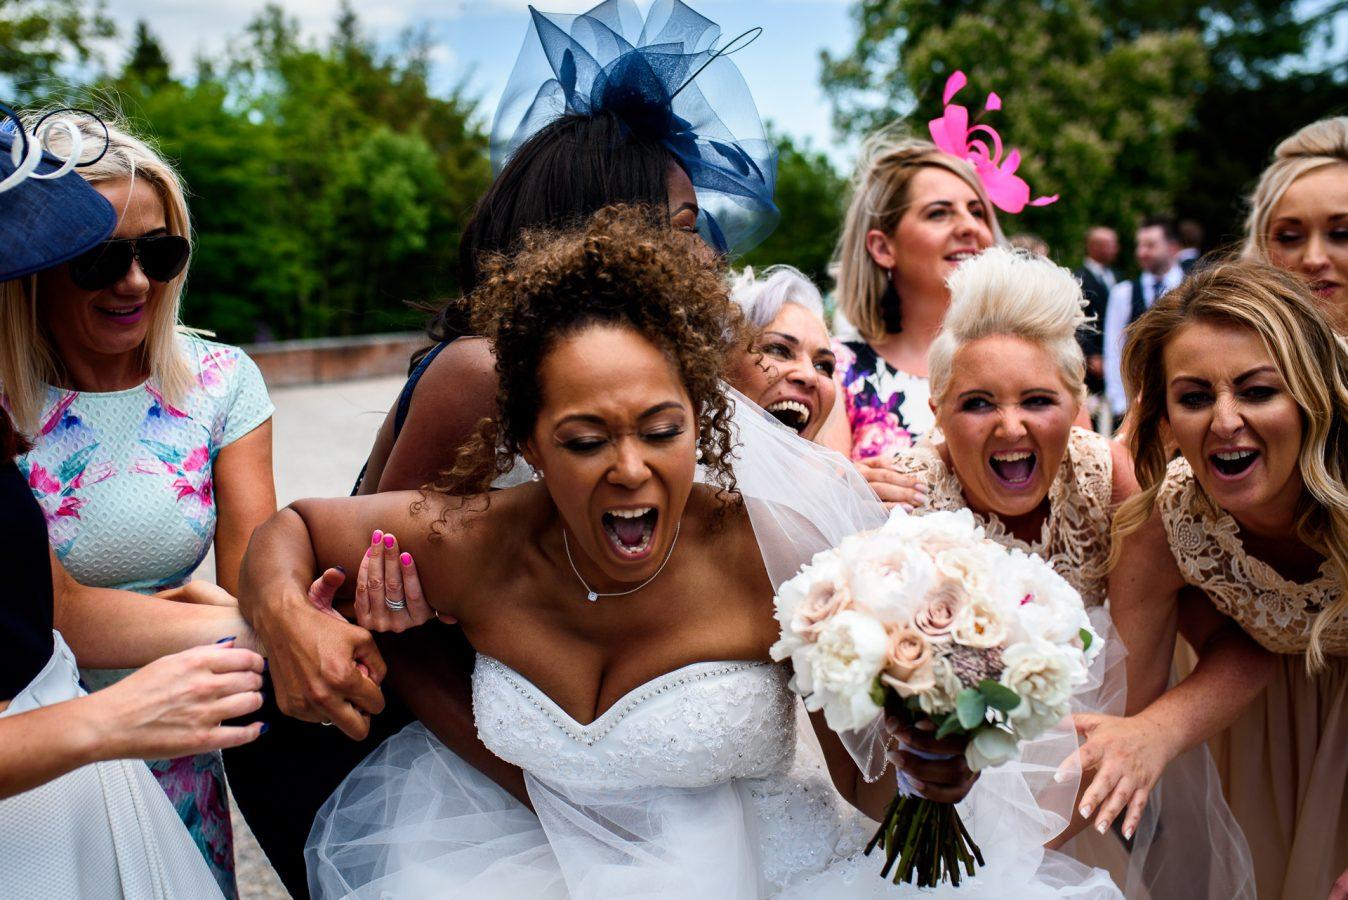 best-wedding-photos-2017-kimberley-and-bridesmaids-laughing